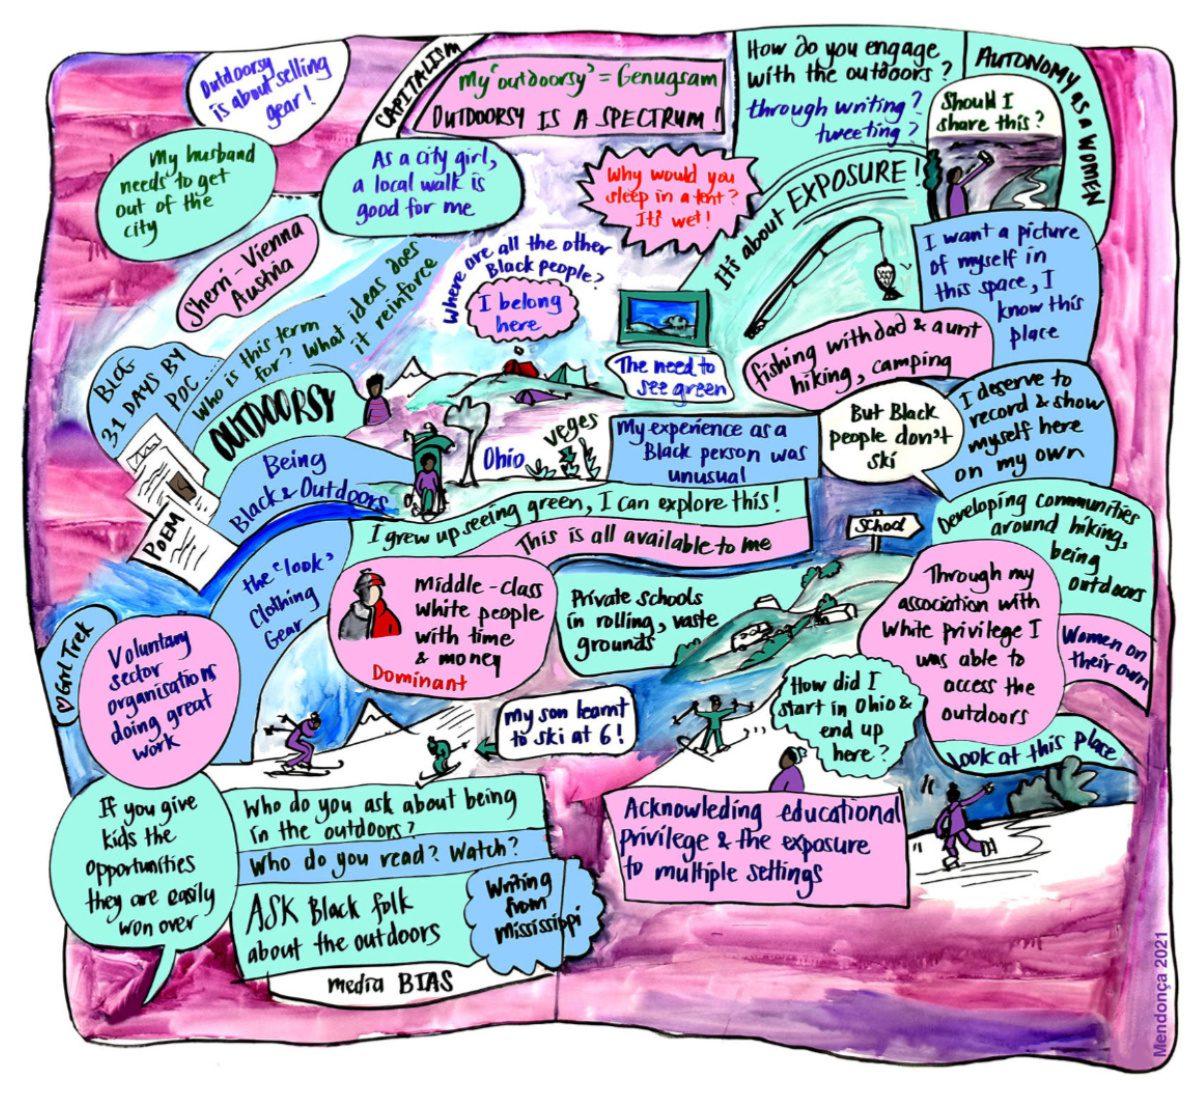 Sherri Spelic's illustrated story